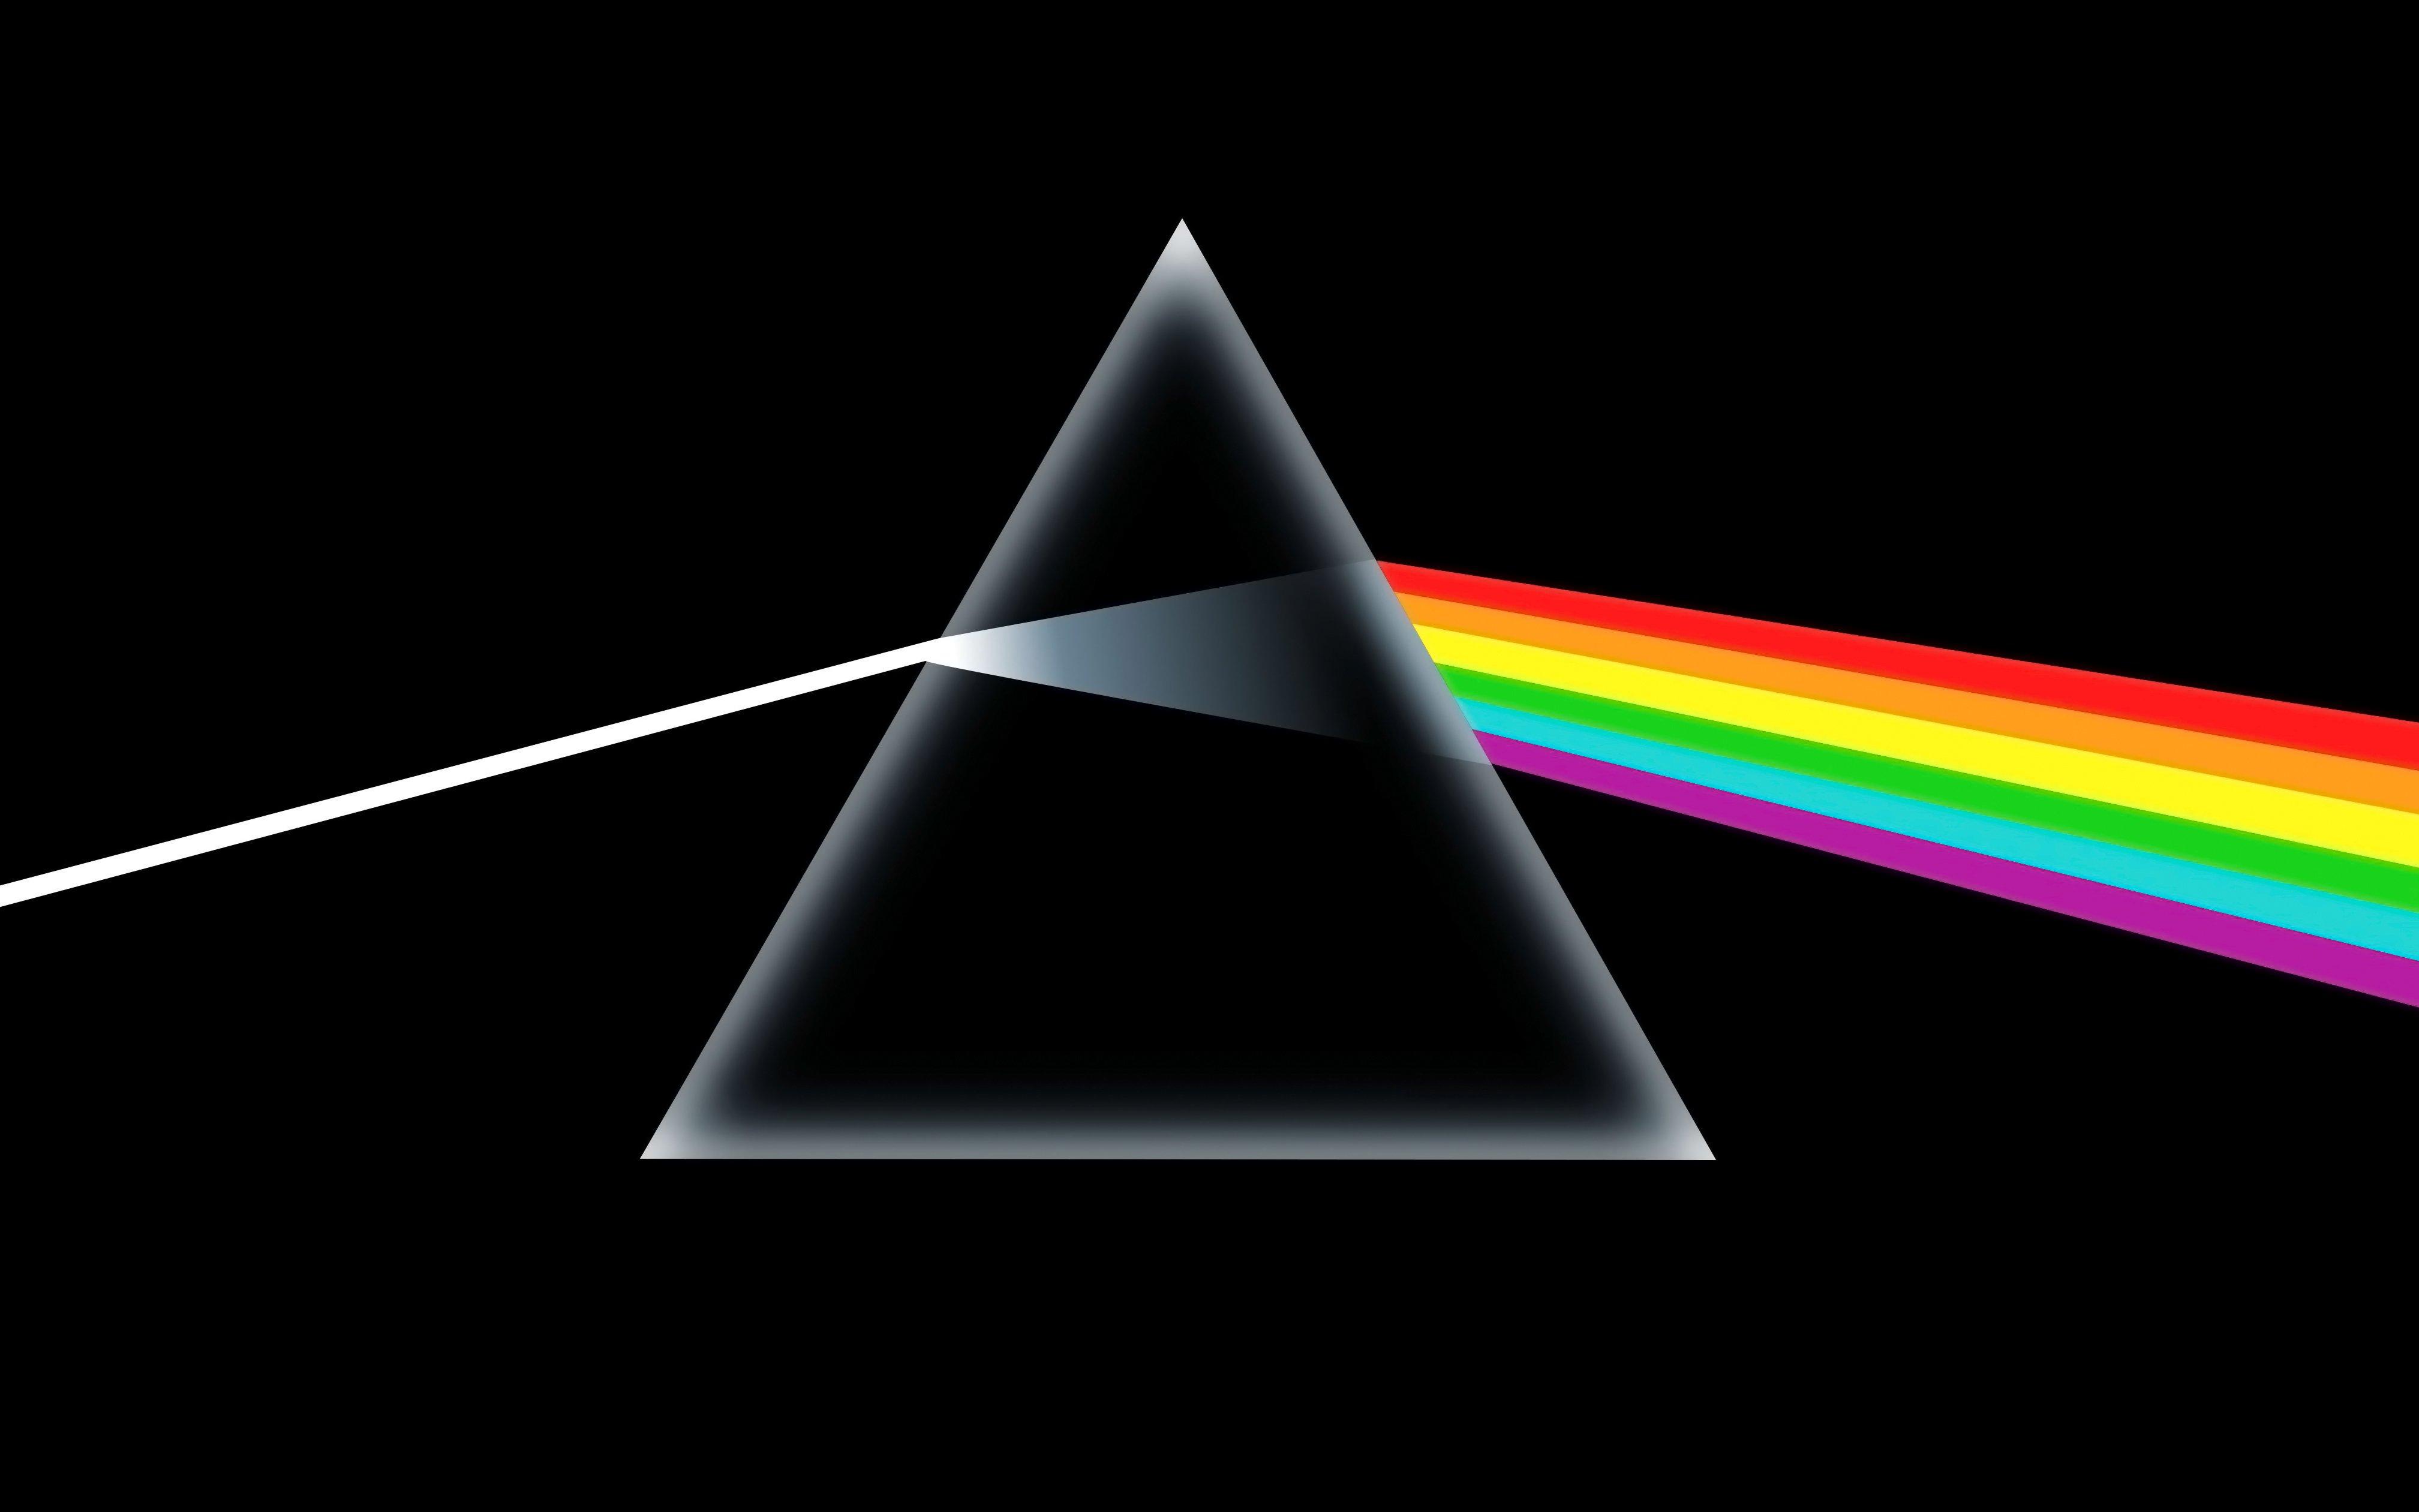 Wallpaper Pink Floyd - The Dark Side of the Moon